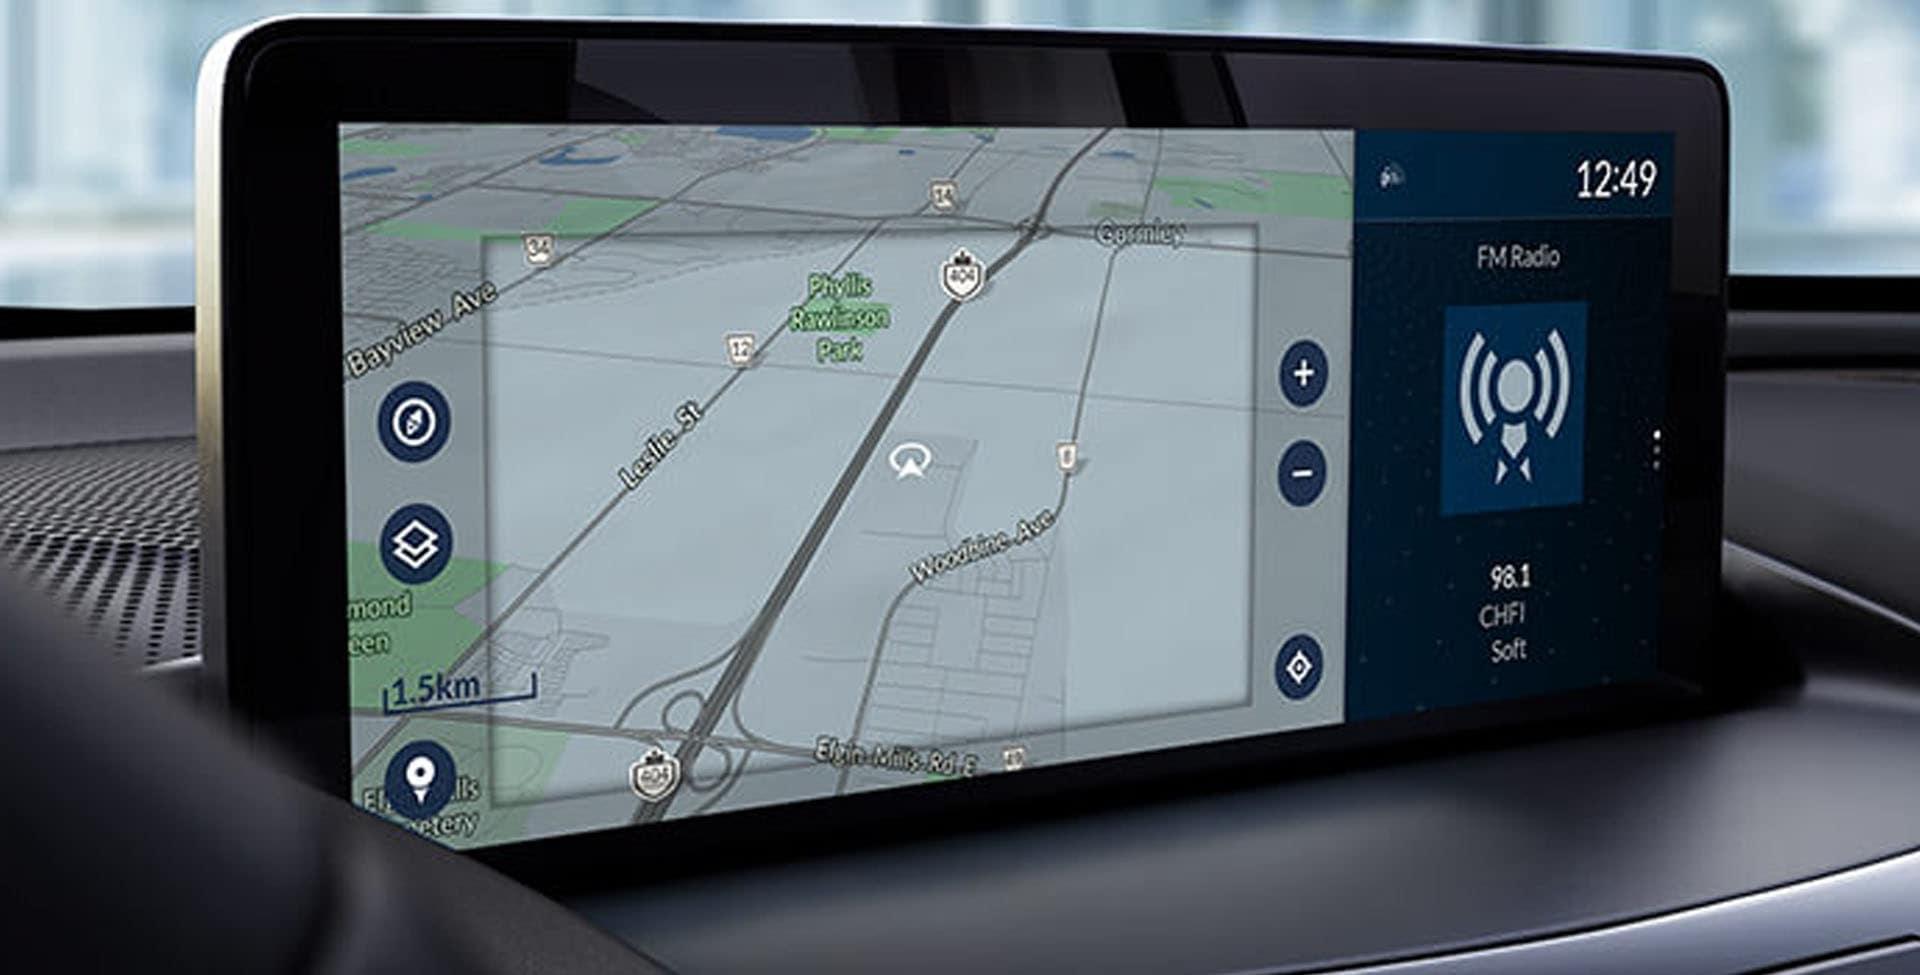 Acura RDX navigation